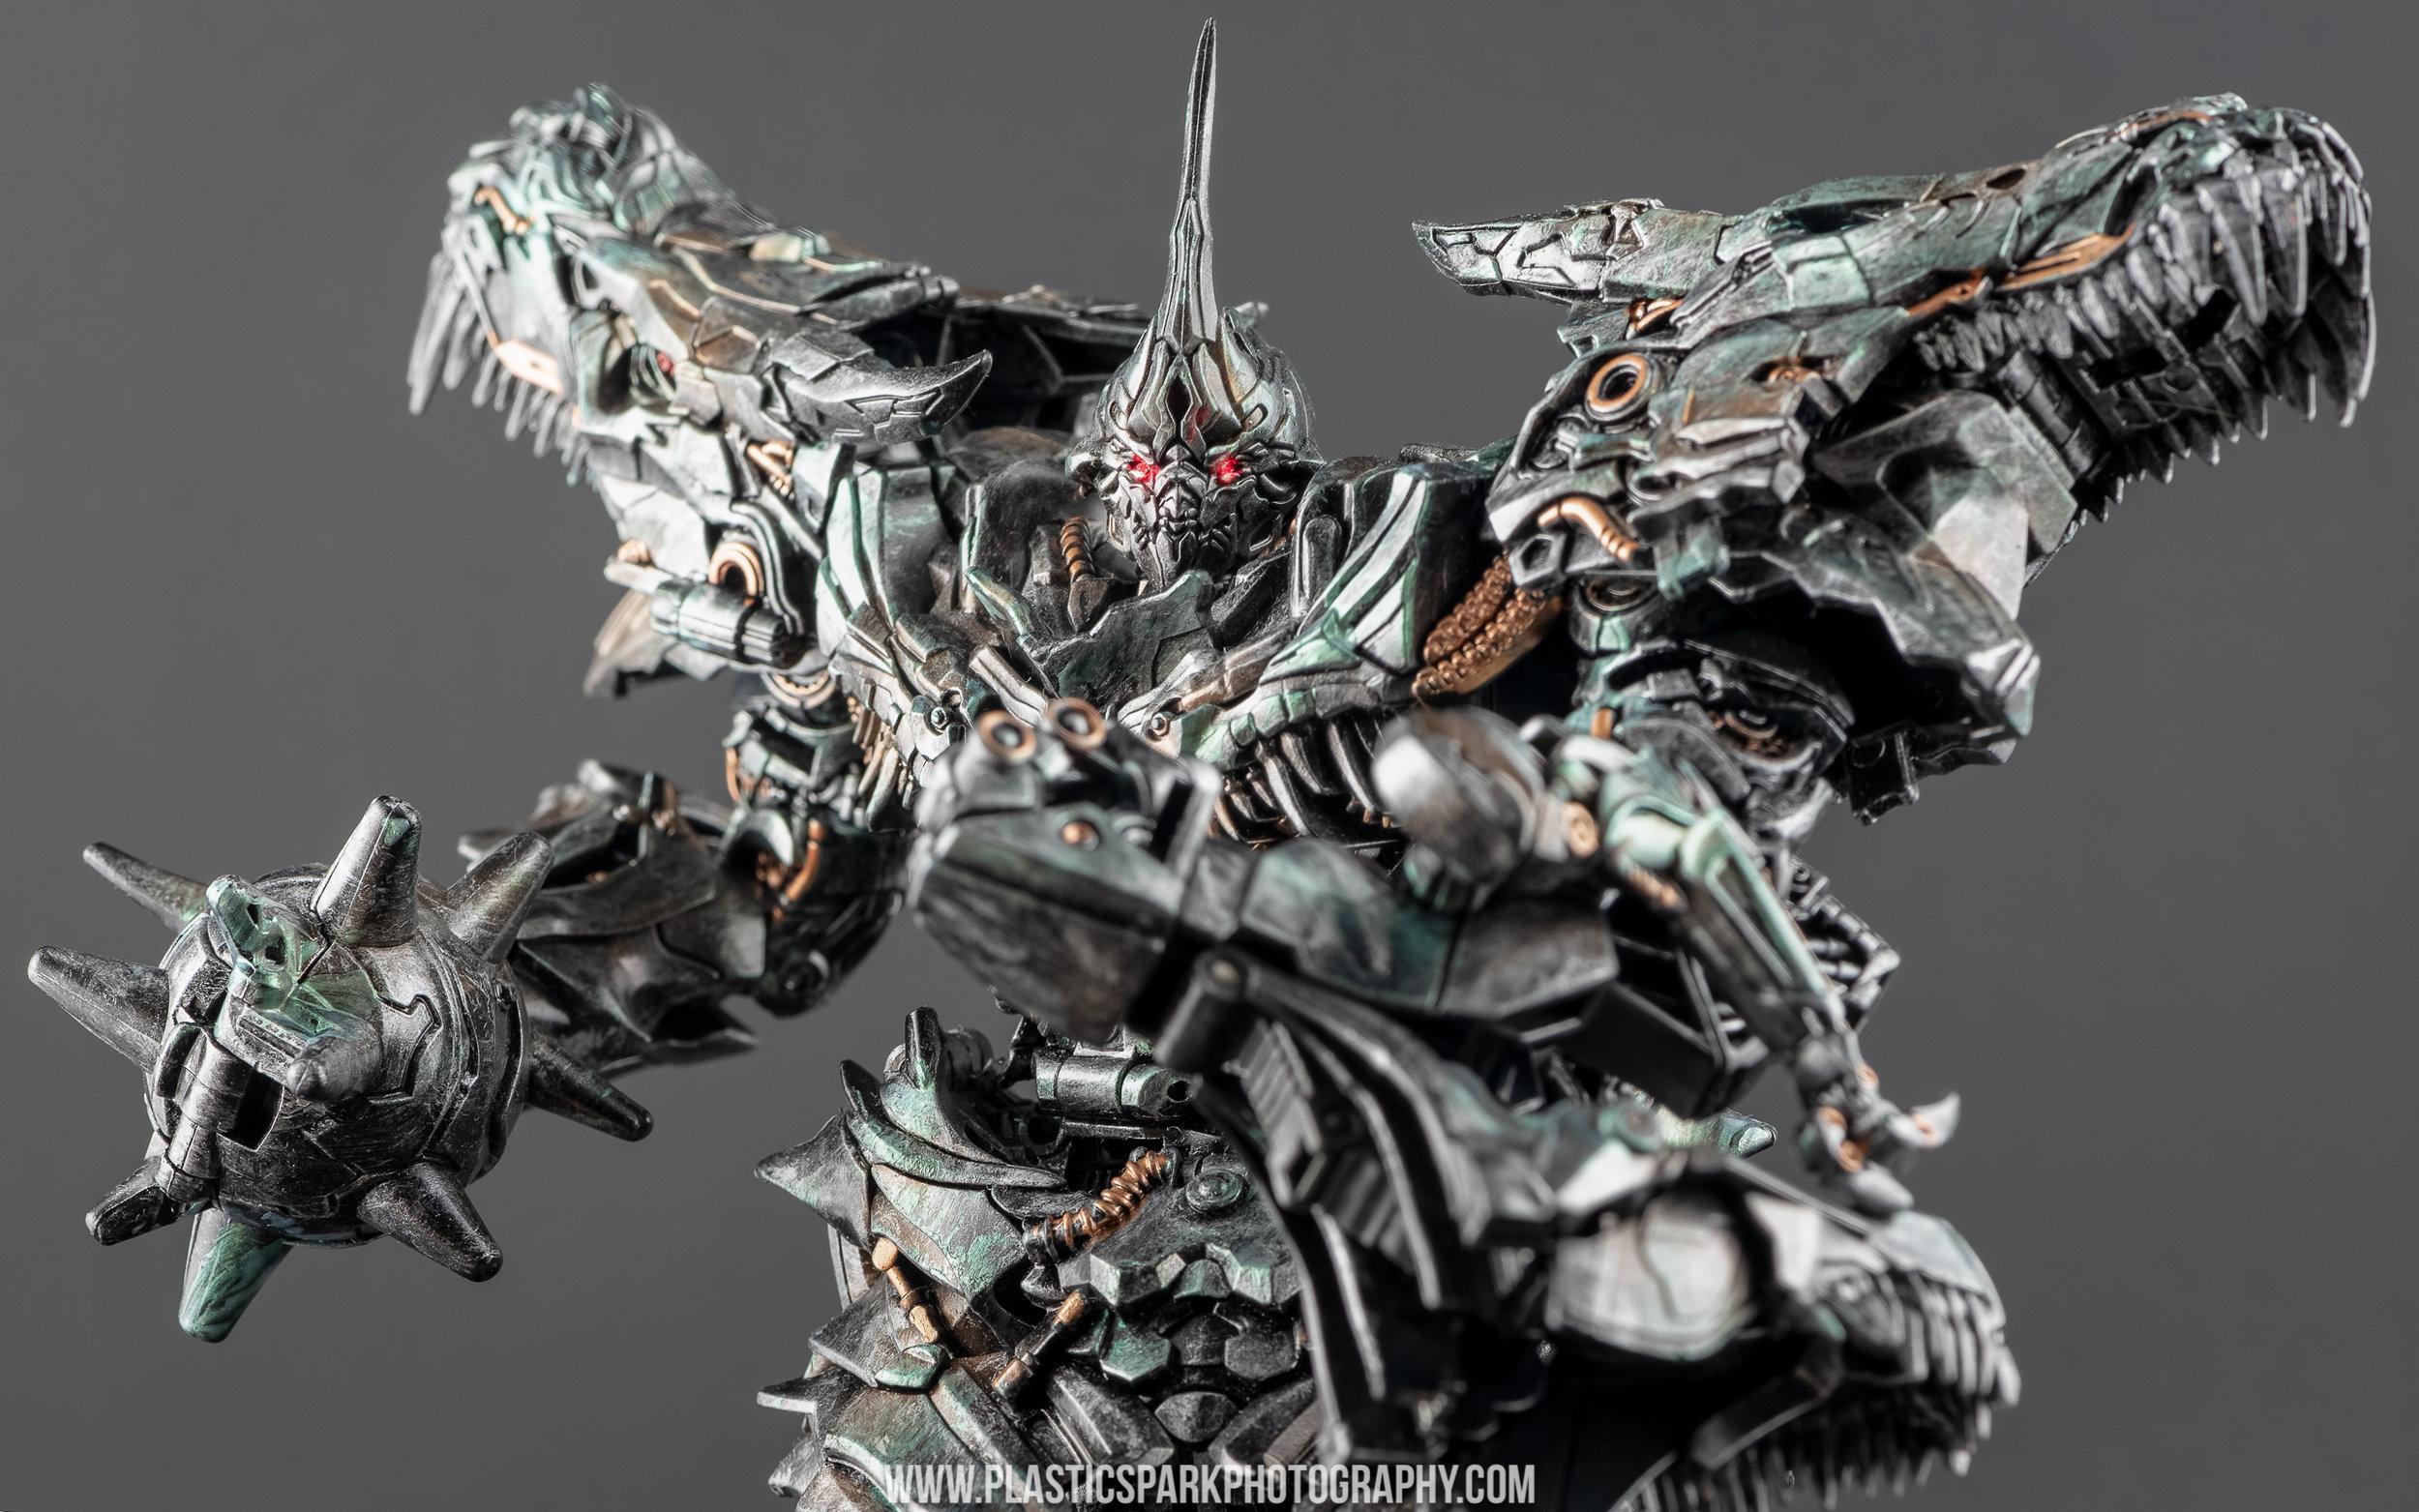 Custom Studio Series Grimlock - Bryan Liu (9 of 27).jpg